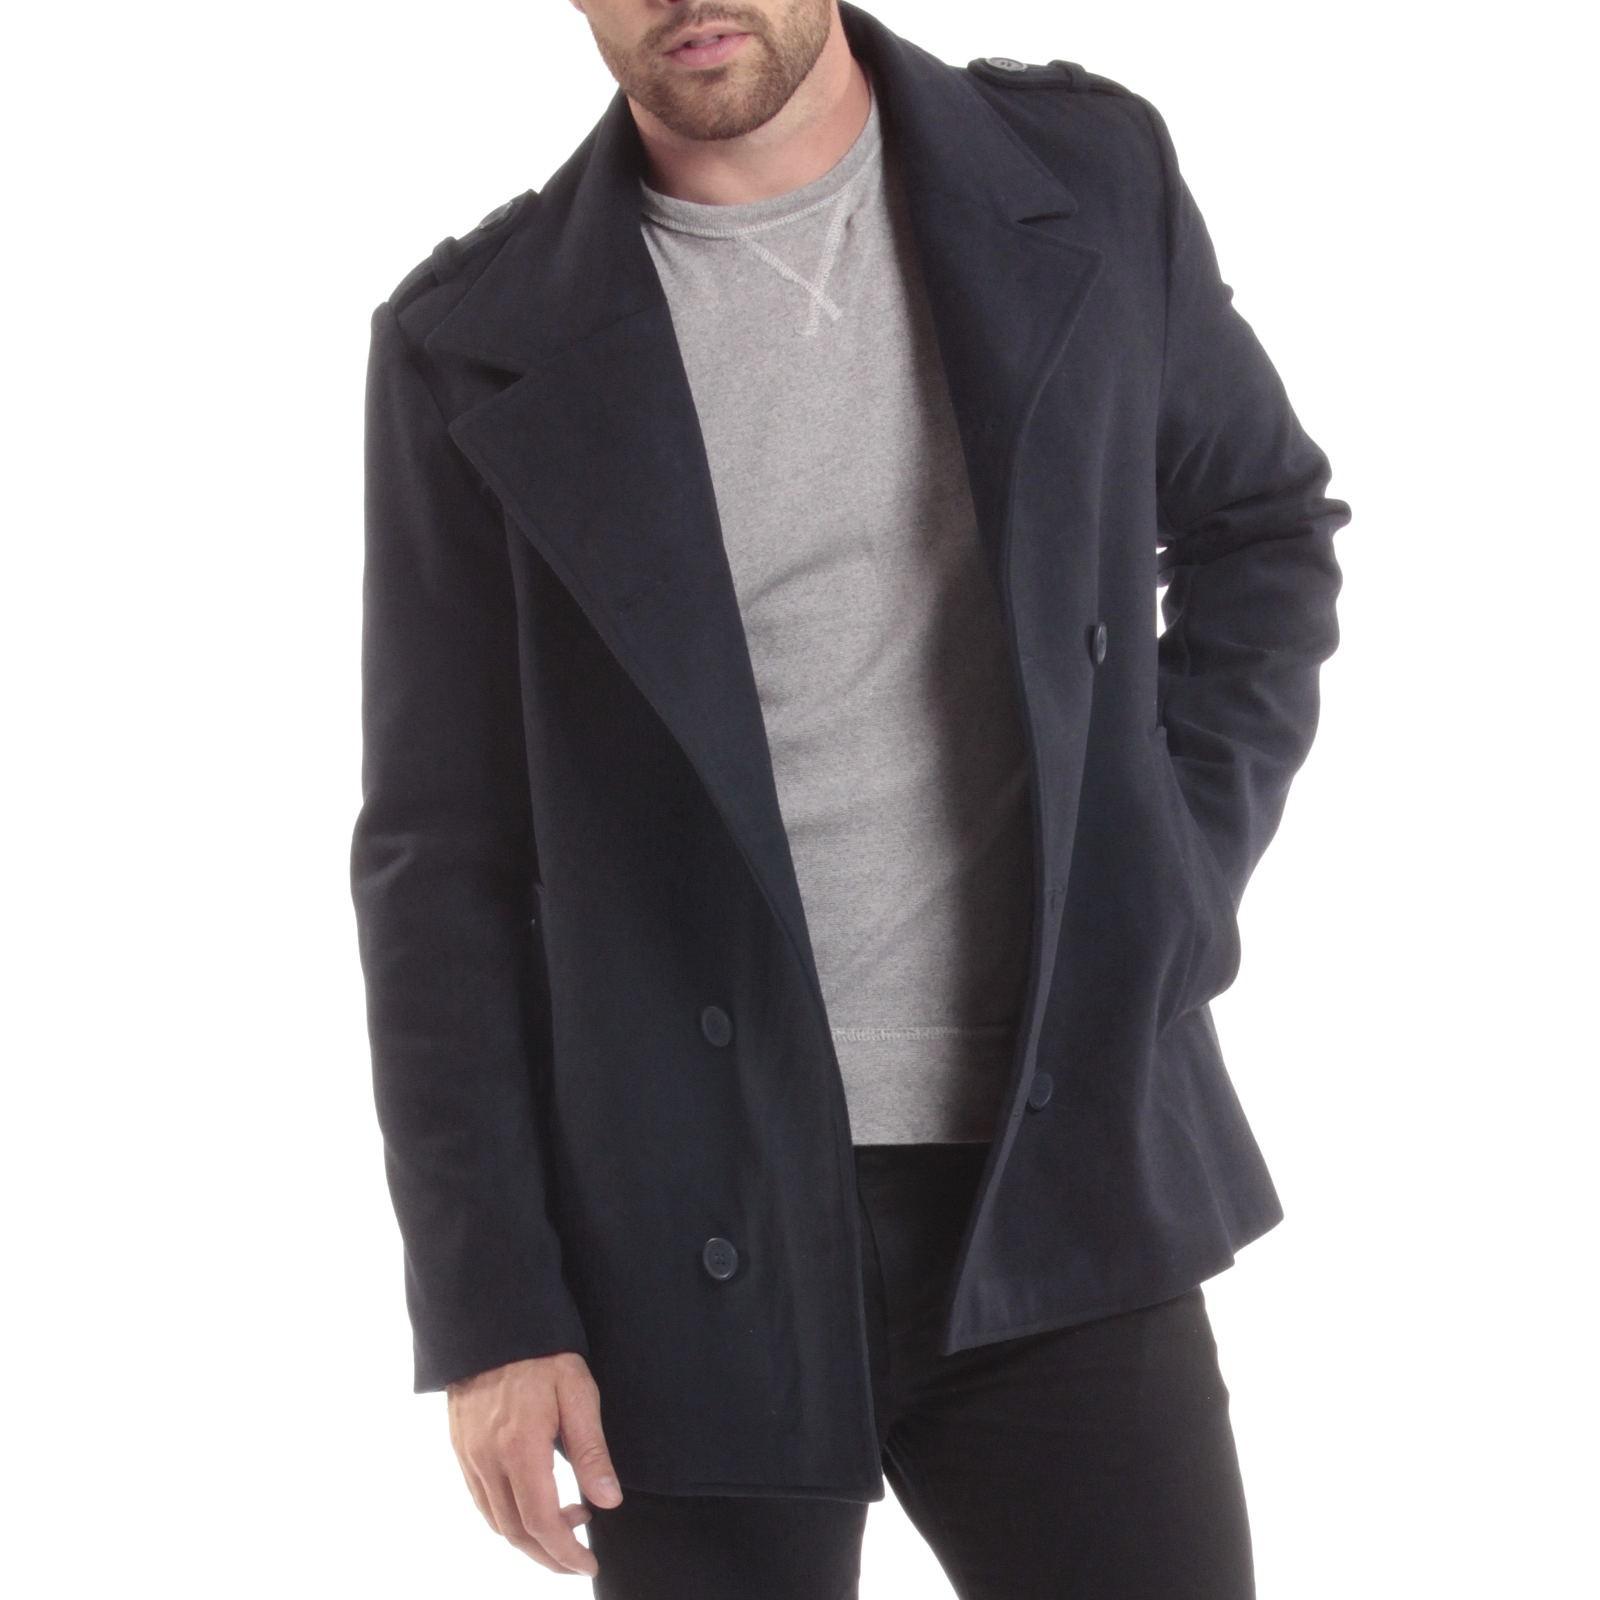 Alpine-Swiss-Jake-Mens-Pea-Coat-Wool-Blend-Double-Breasted-Dress-Jacket-Peacoat